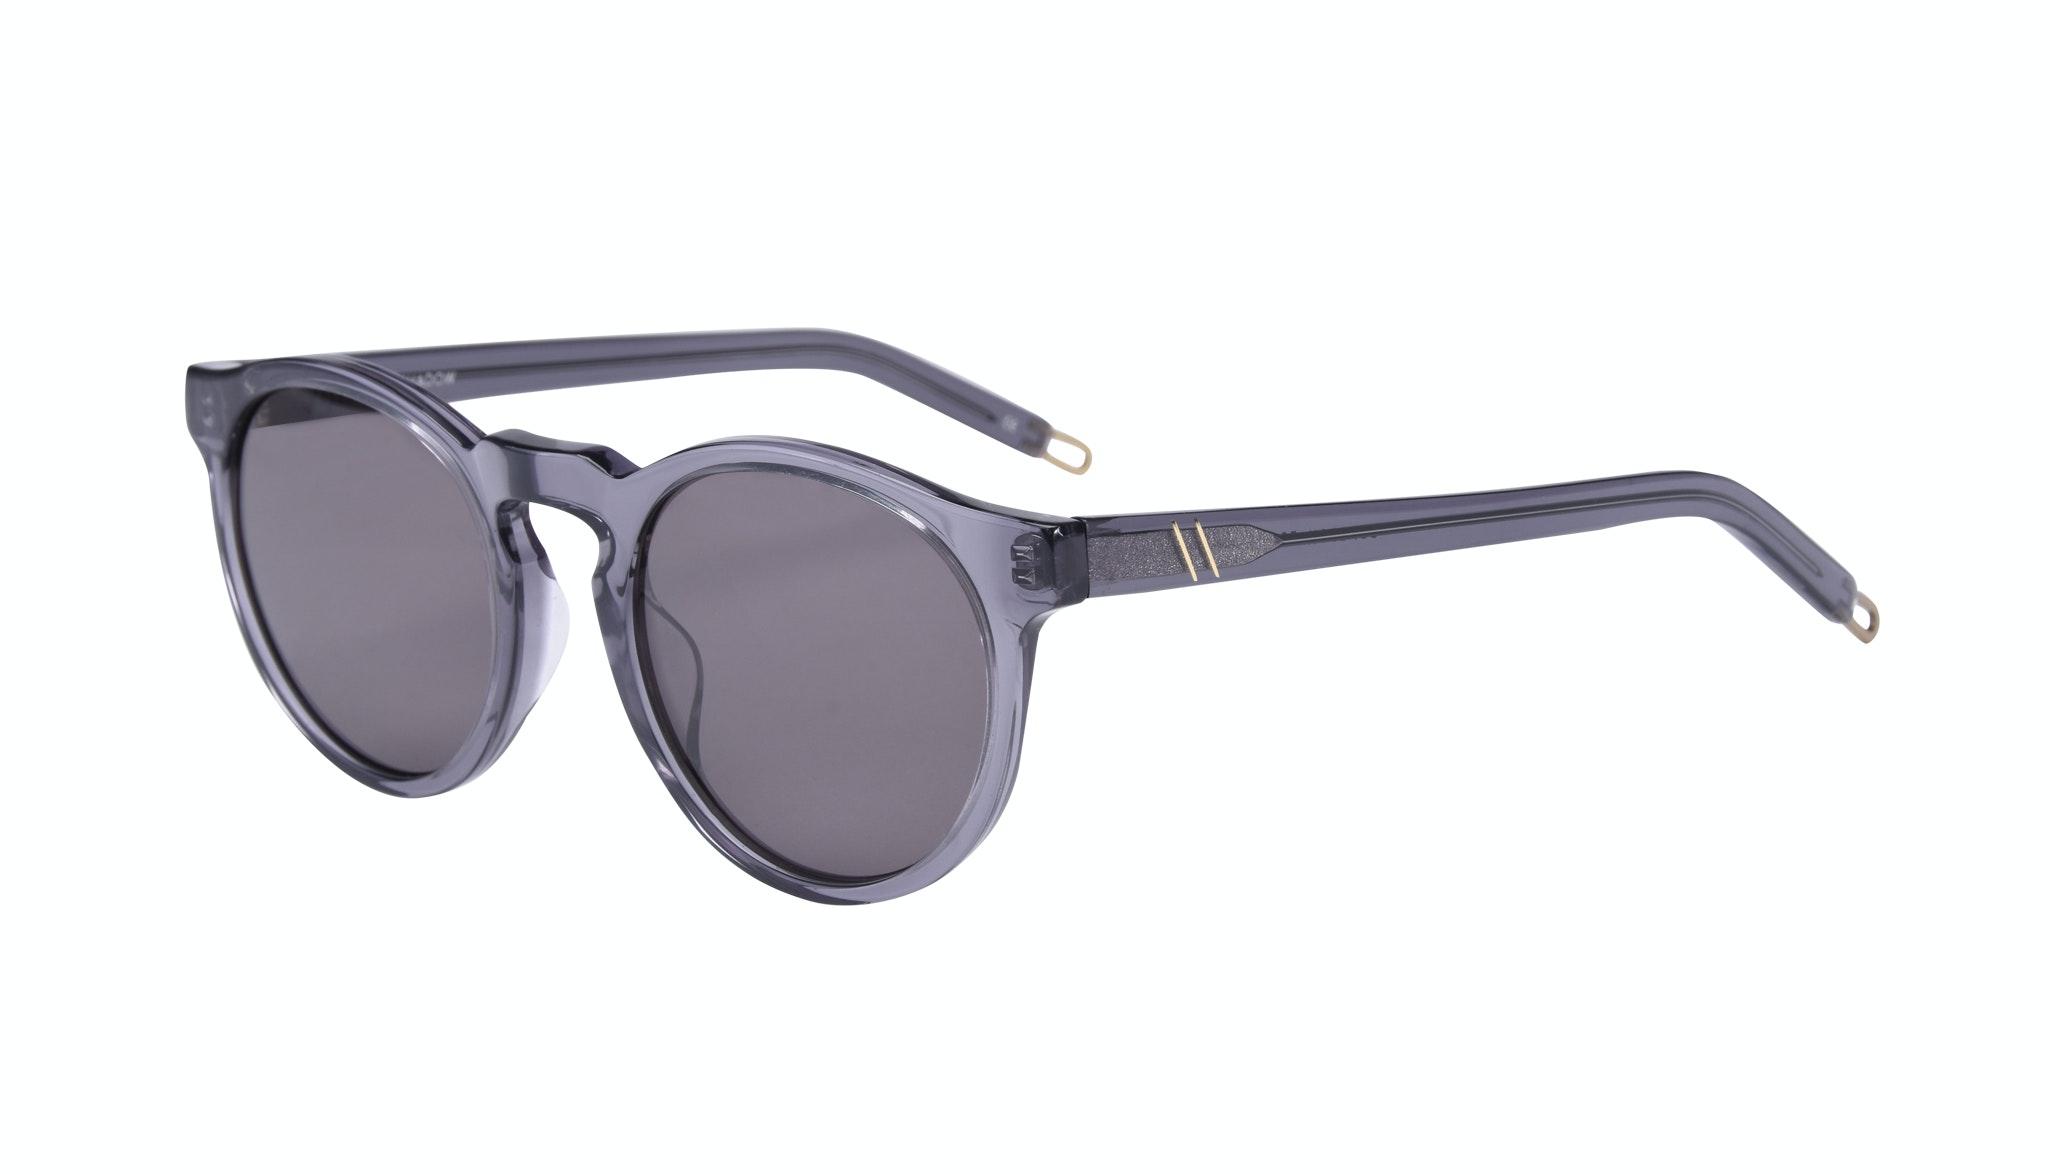 Affordable Fashion Glasses Round Sunglasses Men Ace Shadow Tilt